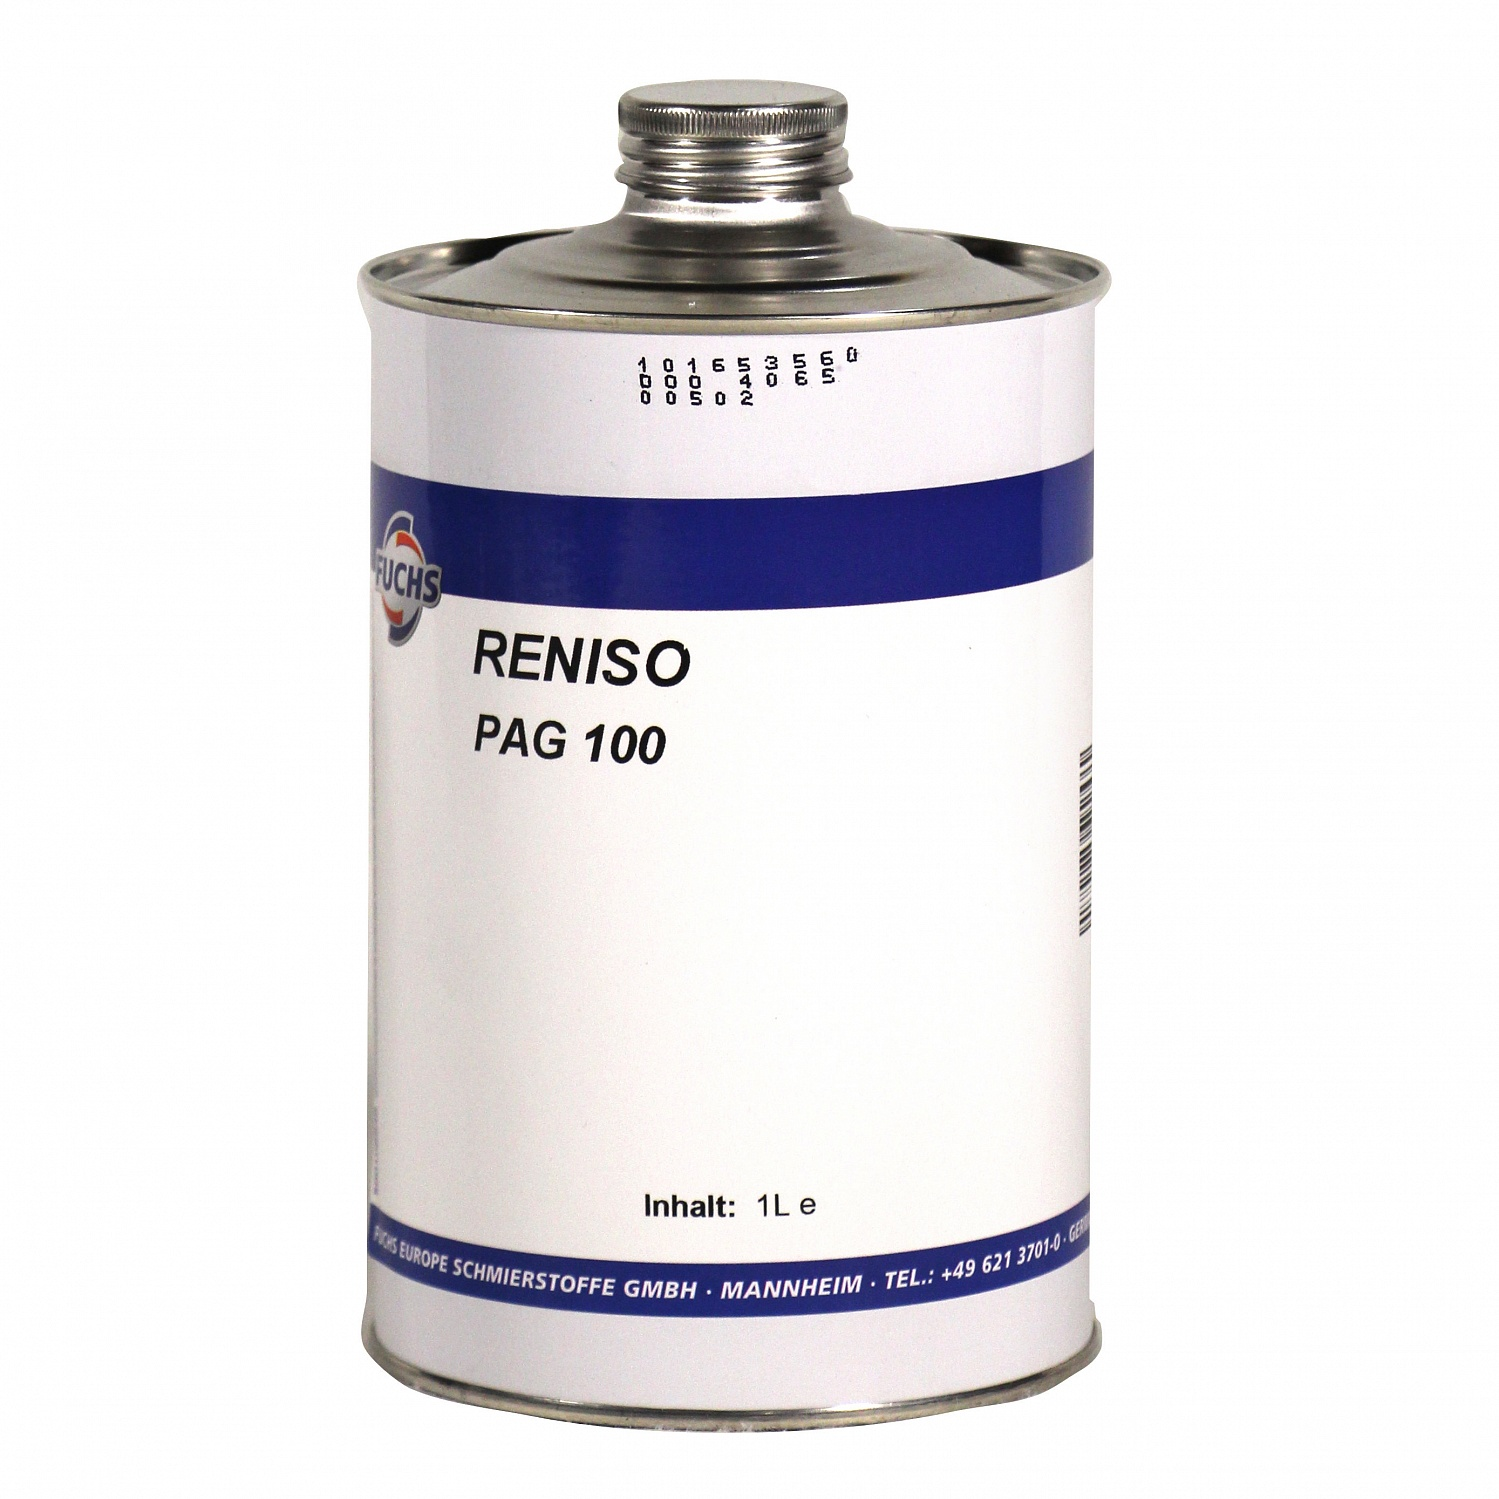 RENISO Кондиционерное масло PAG 100 1л